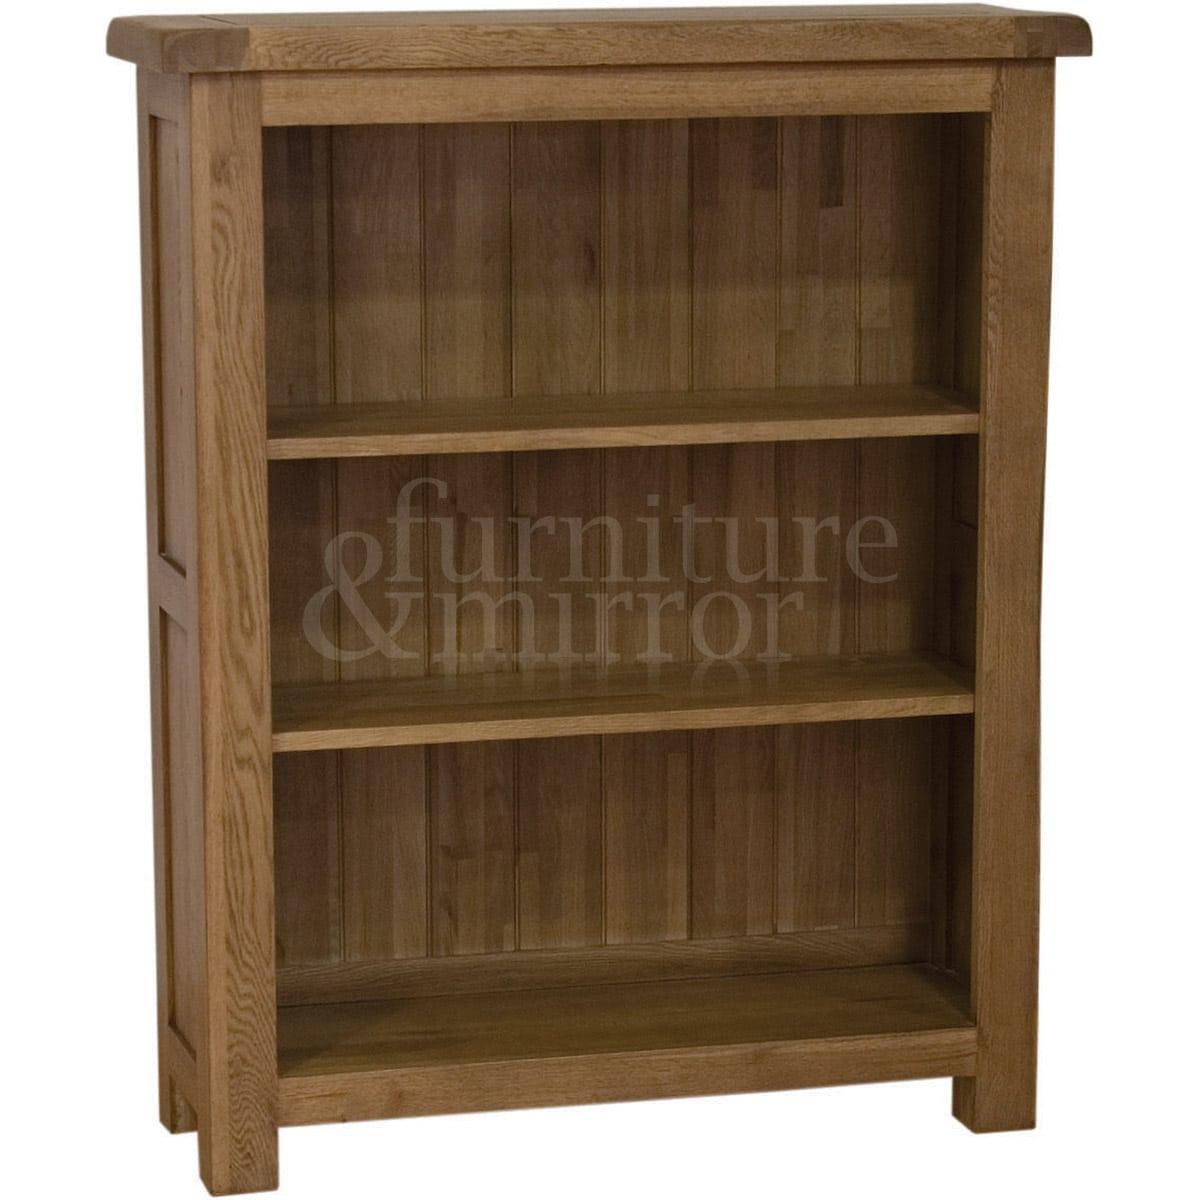 rustic small bookcase 245 00 rustic small bookcase with three shelves ...